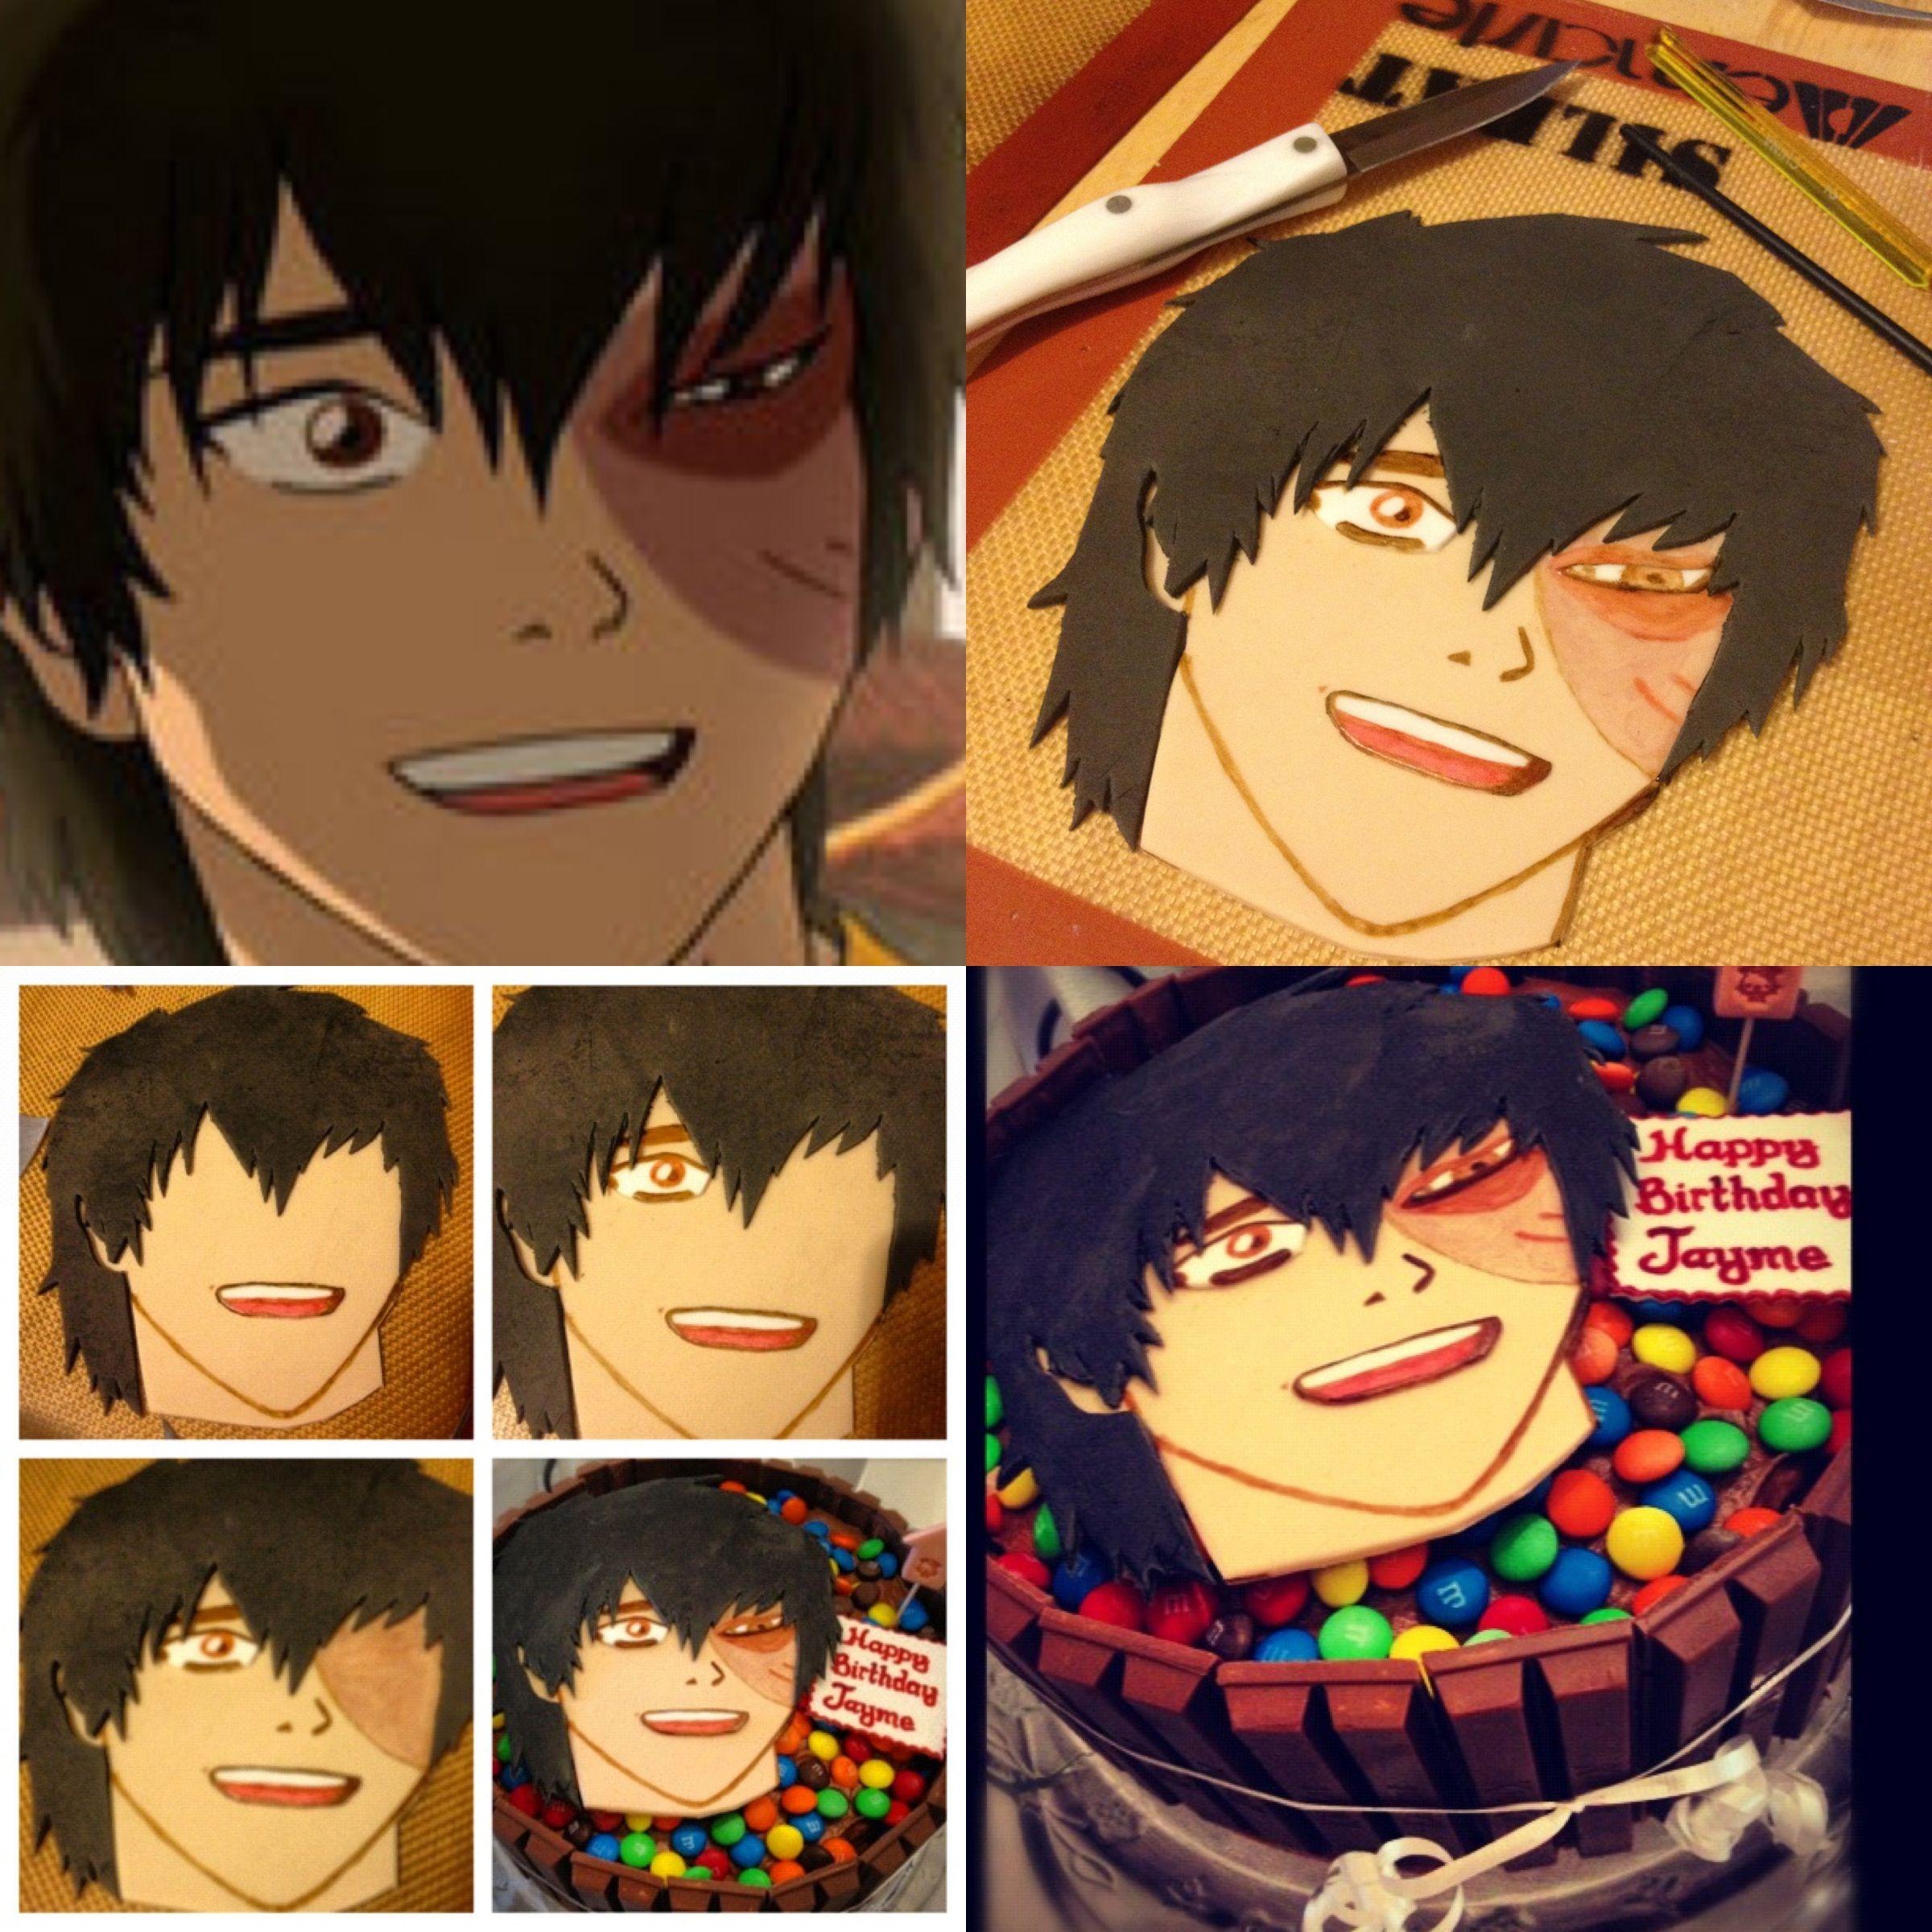 Prince Zuko, Avatar, ATLAB, The Last Air Bender, Edible Face, Cake ...